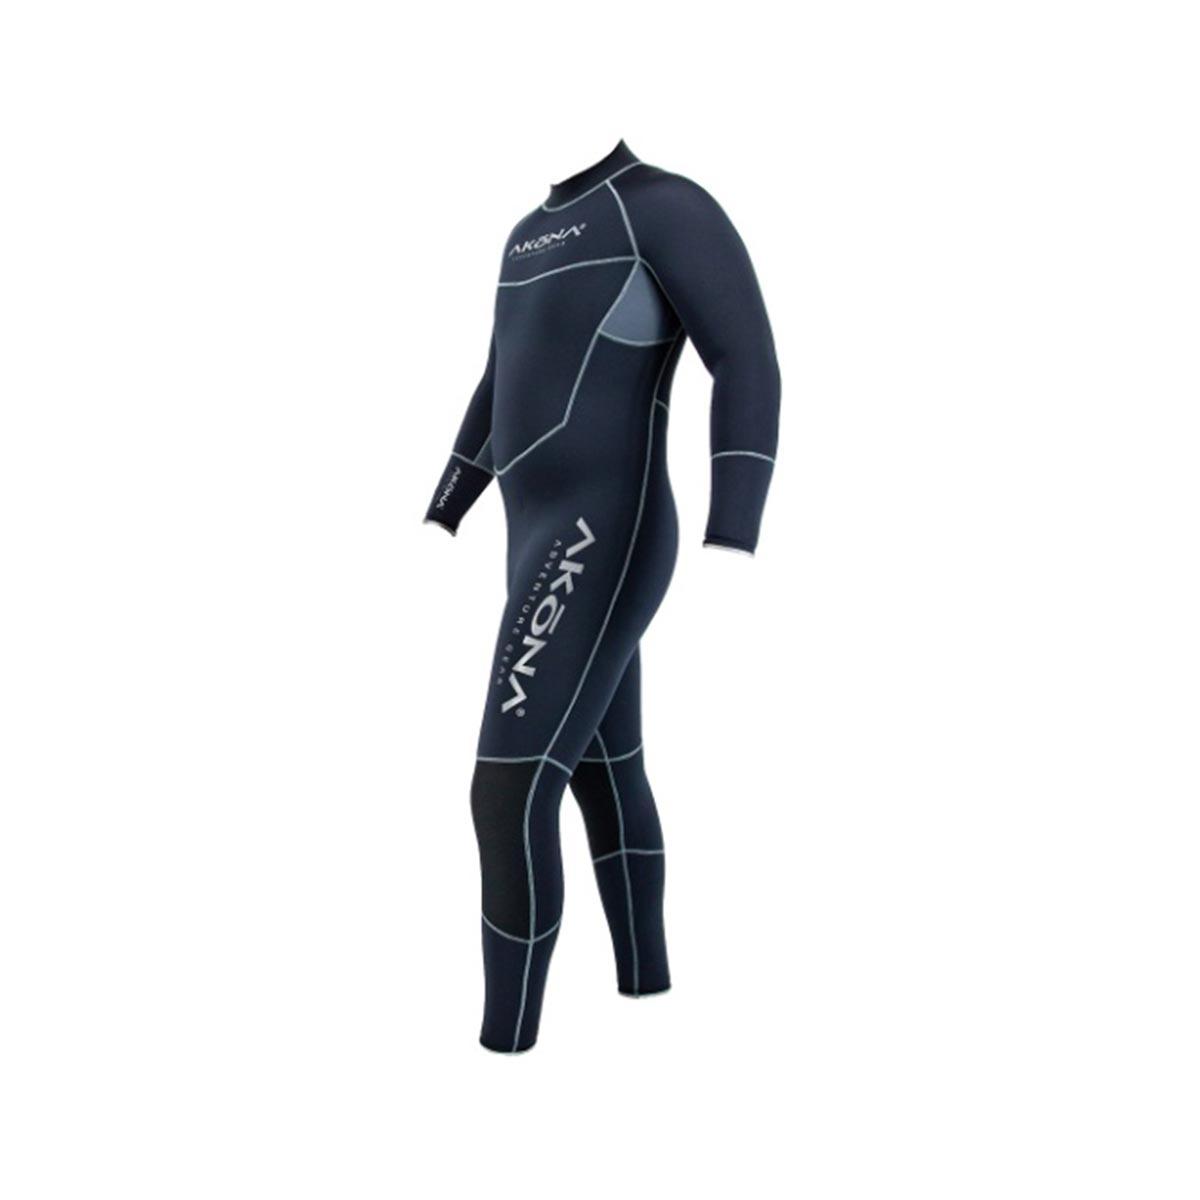 Wet Suit 7 mm AKONA pour homme